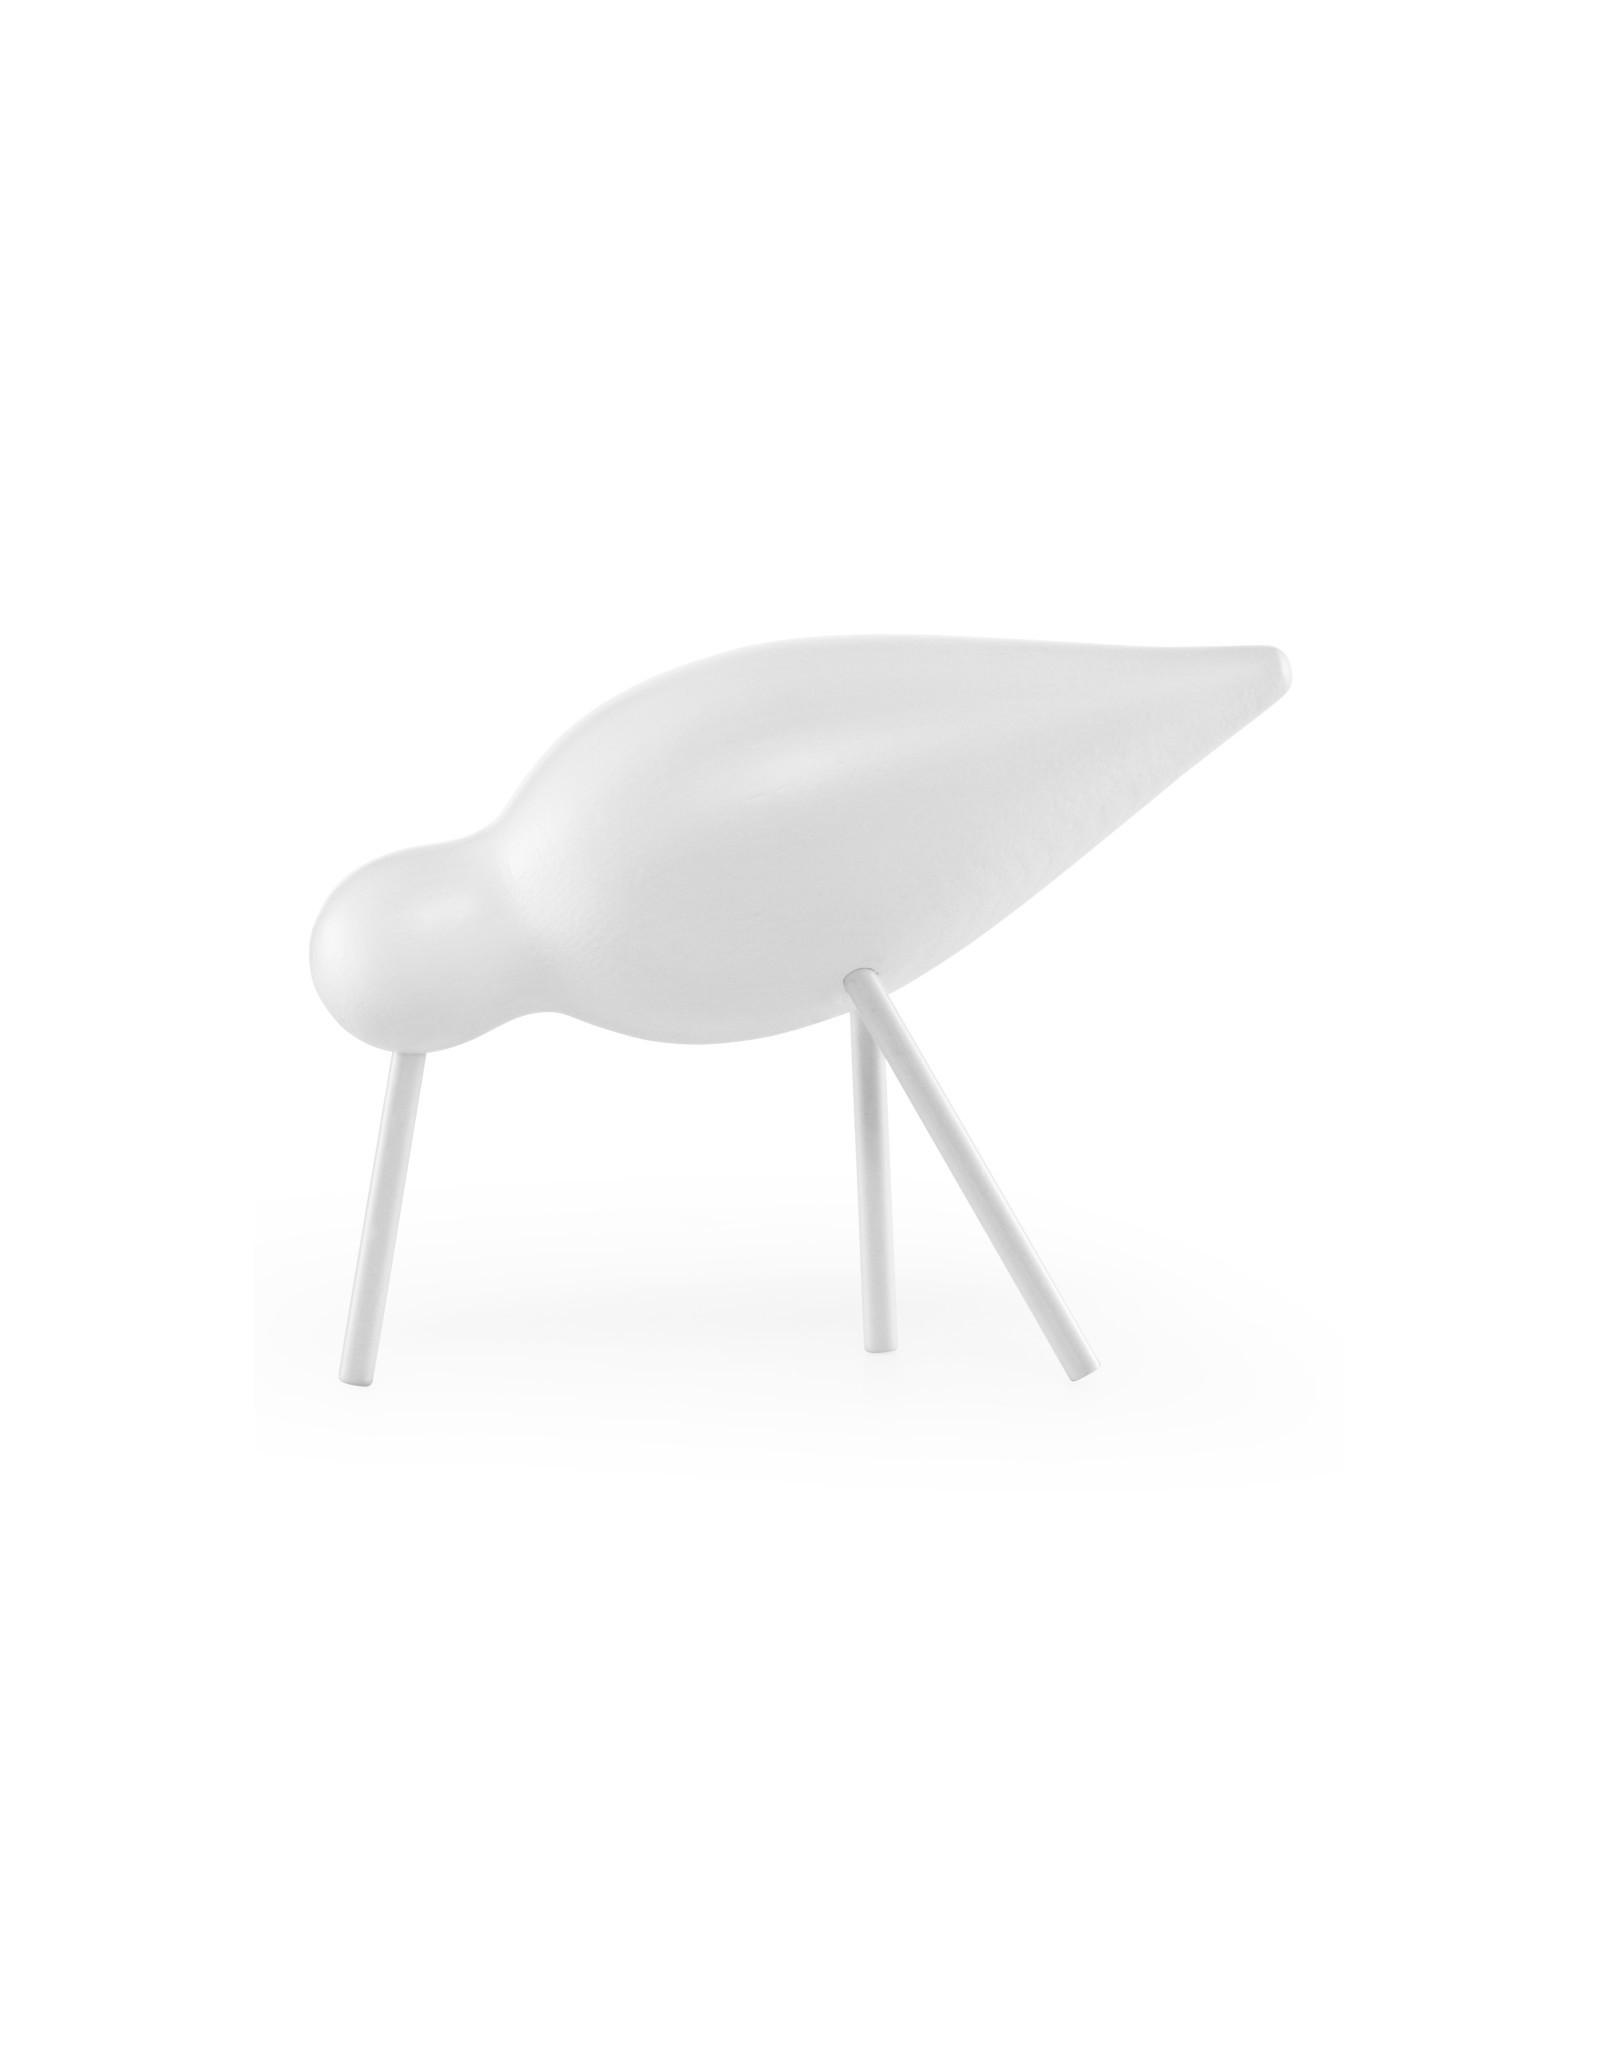 Normann Copenhagen Normann Shorebird Medium White/White